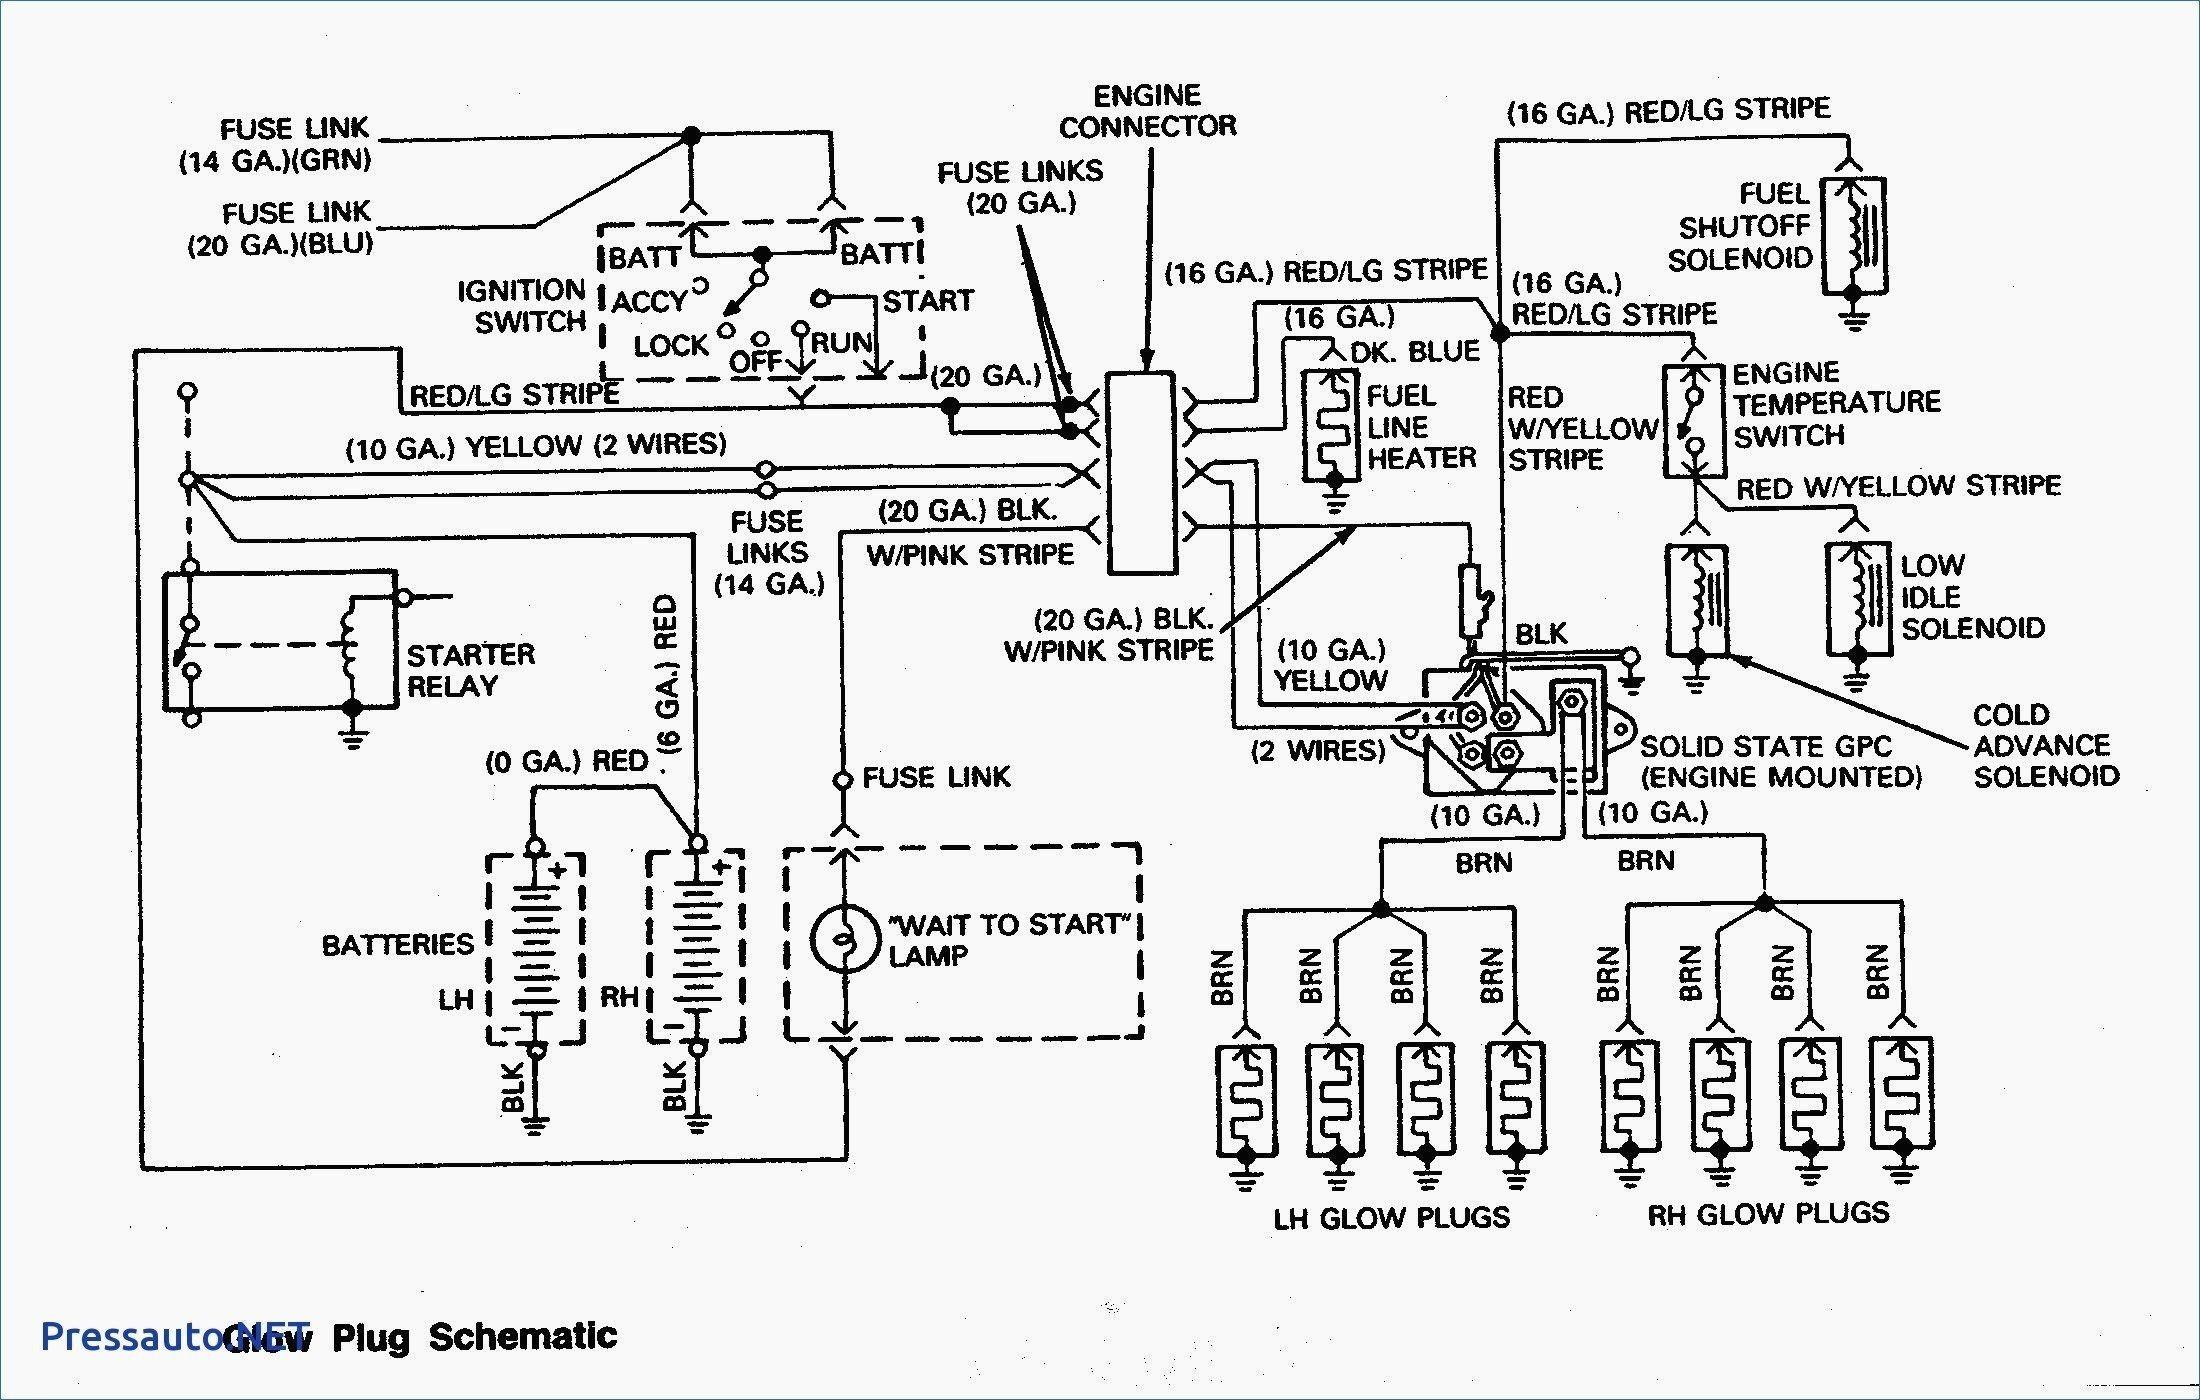 Viper 3305v Wiring Diagram Elegant   Wiring Diagram Image on